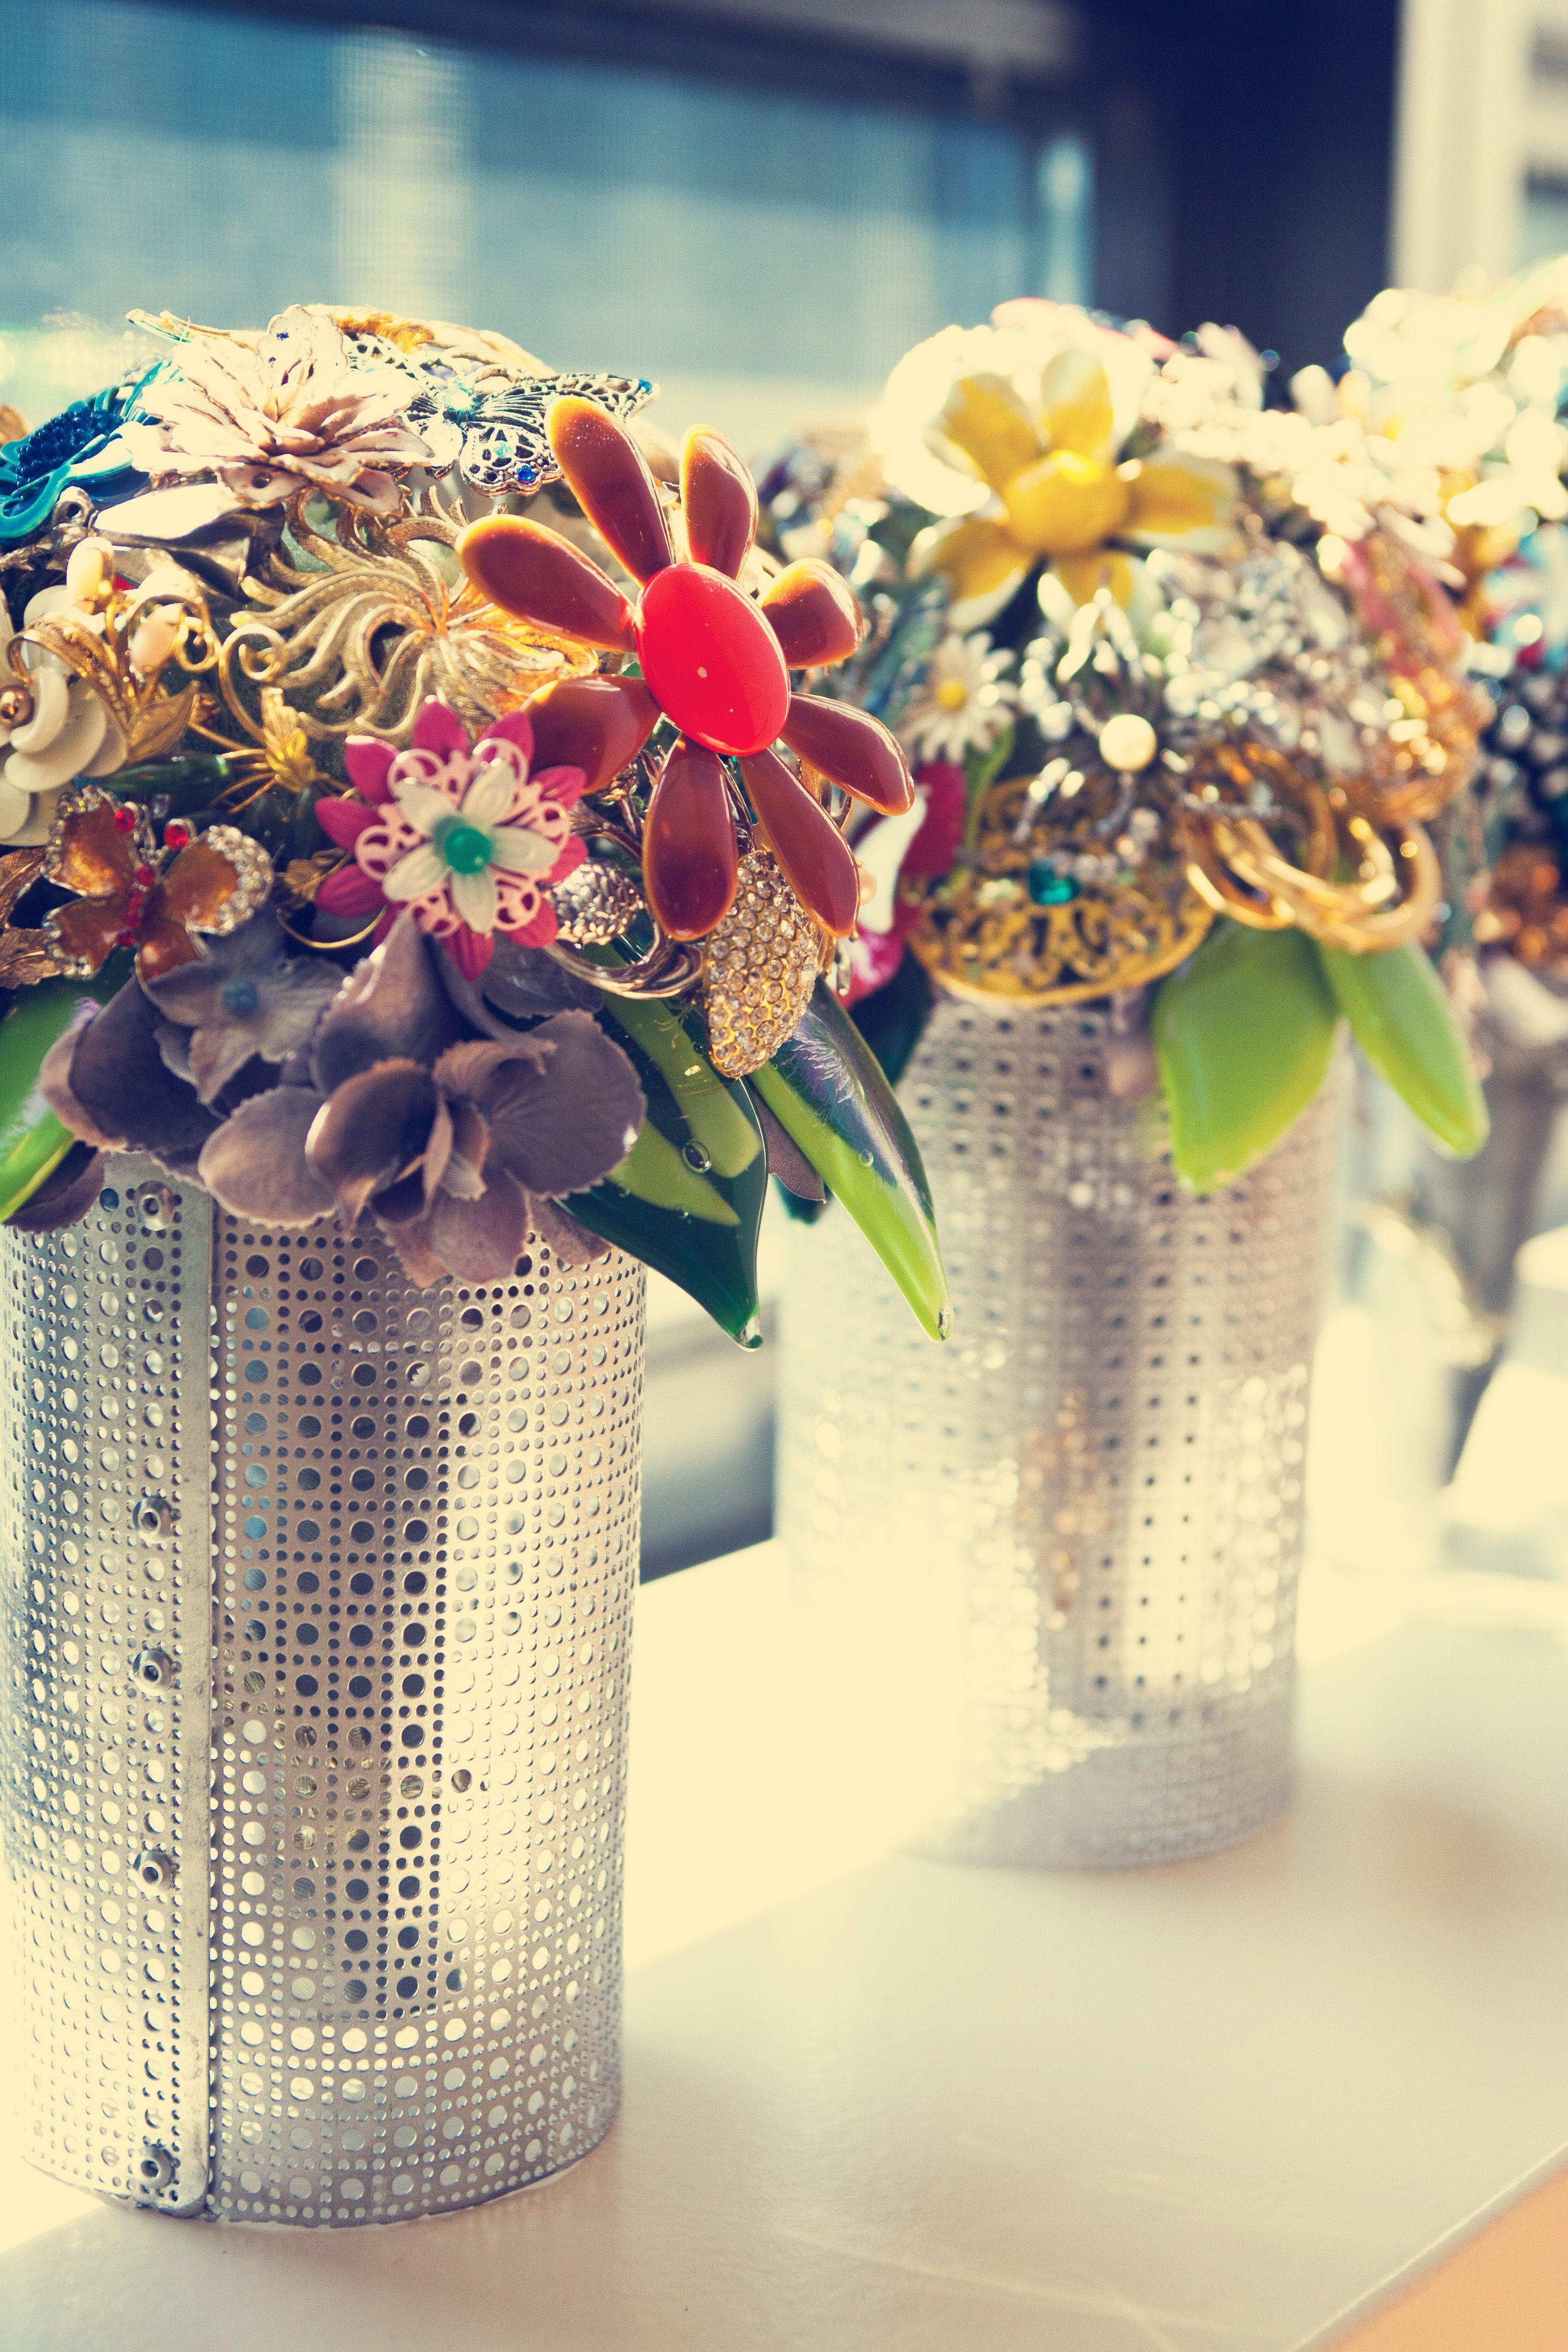 Broach bouquets! Photo by Heidi S. #minneapolisweddingphotographers